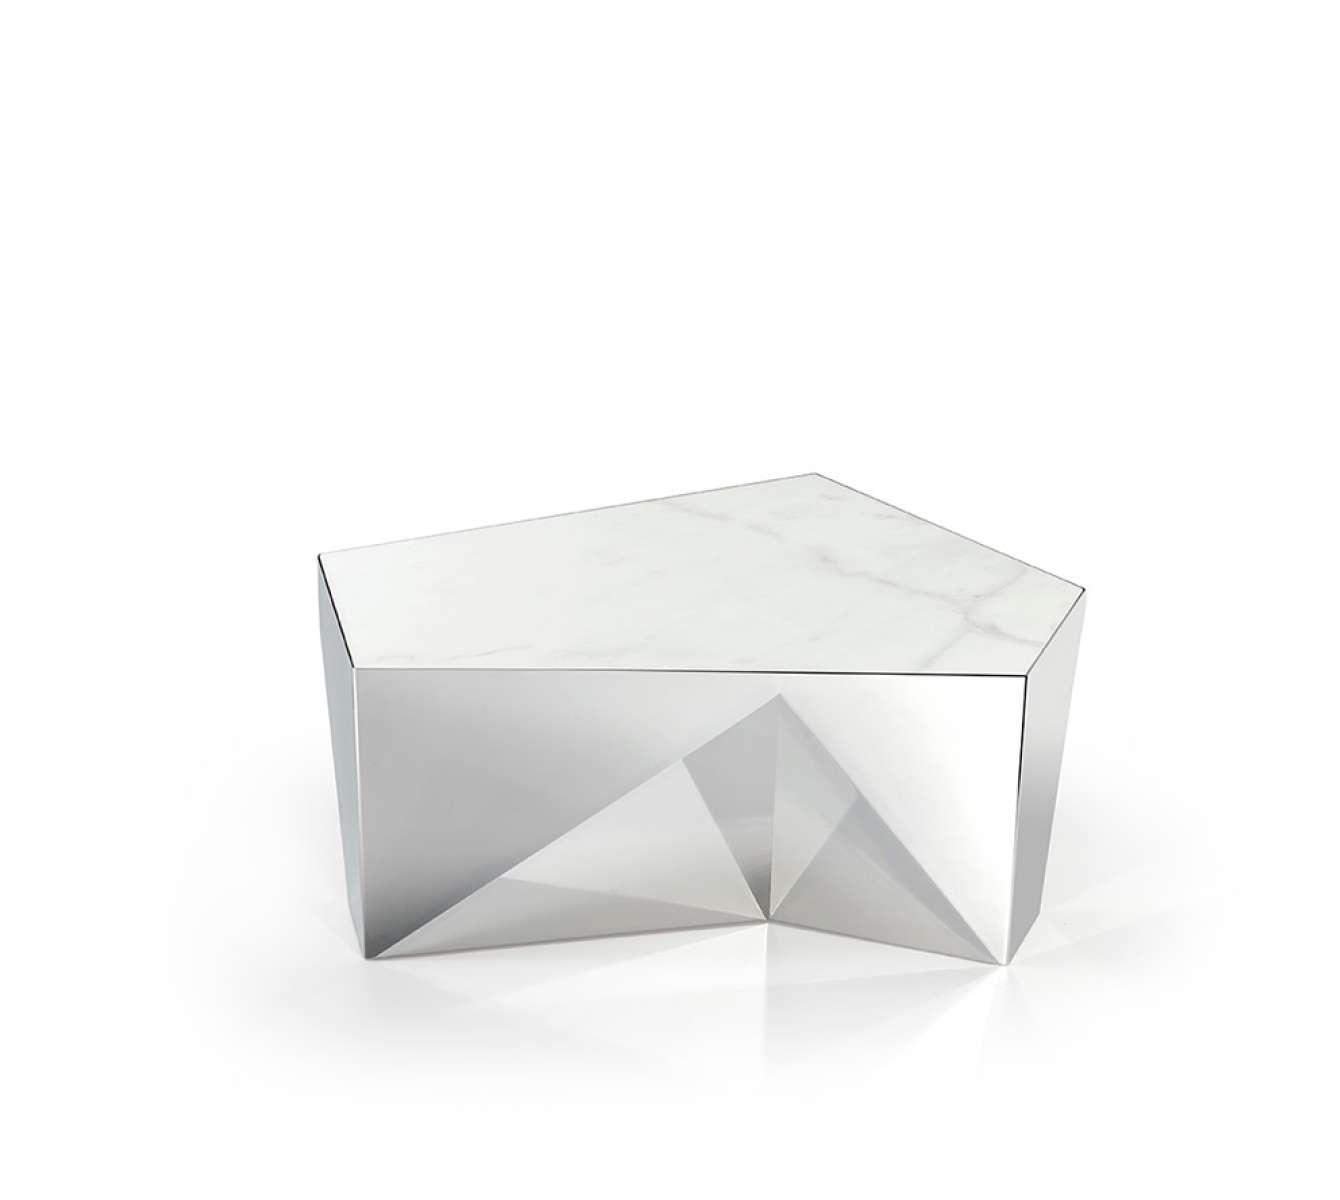 Studio Marco Piva – Product design – 407